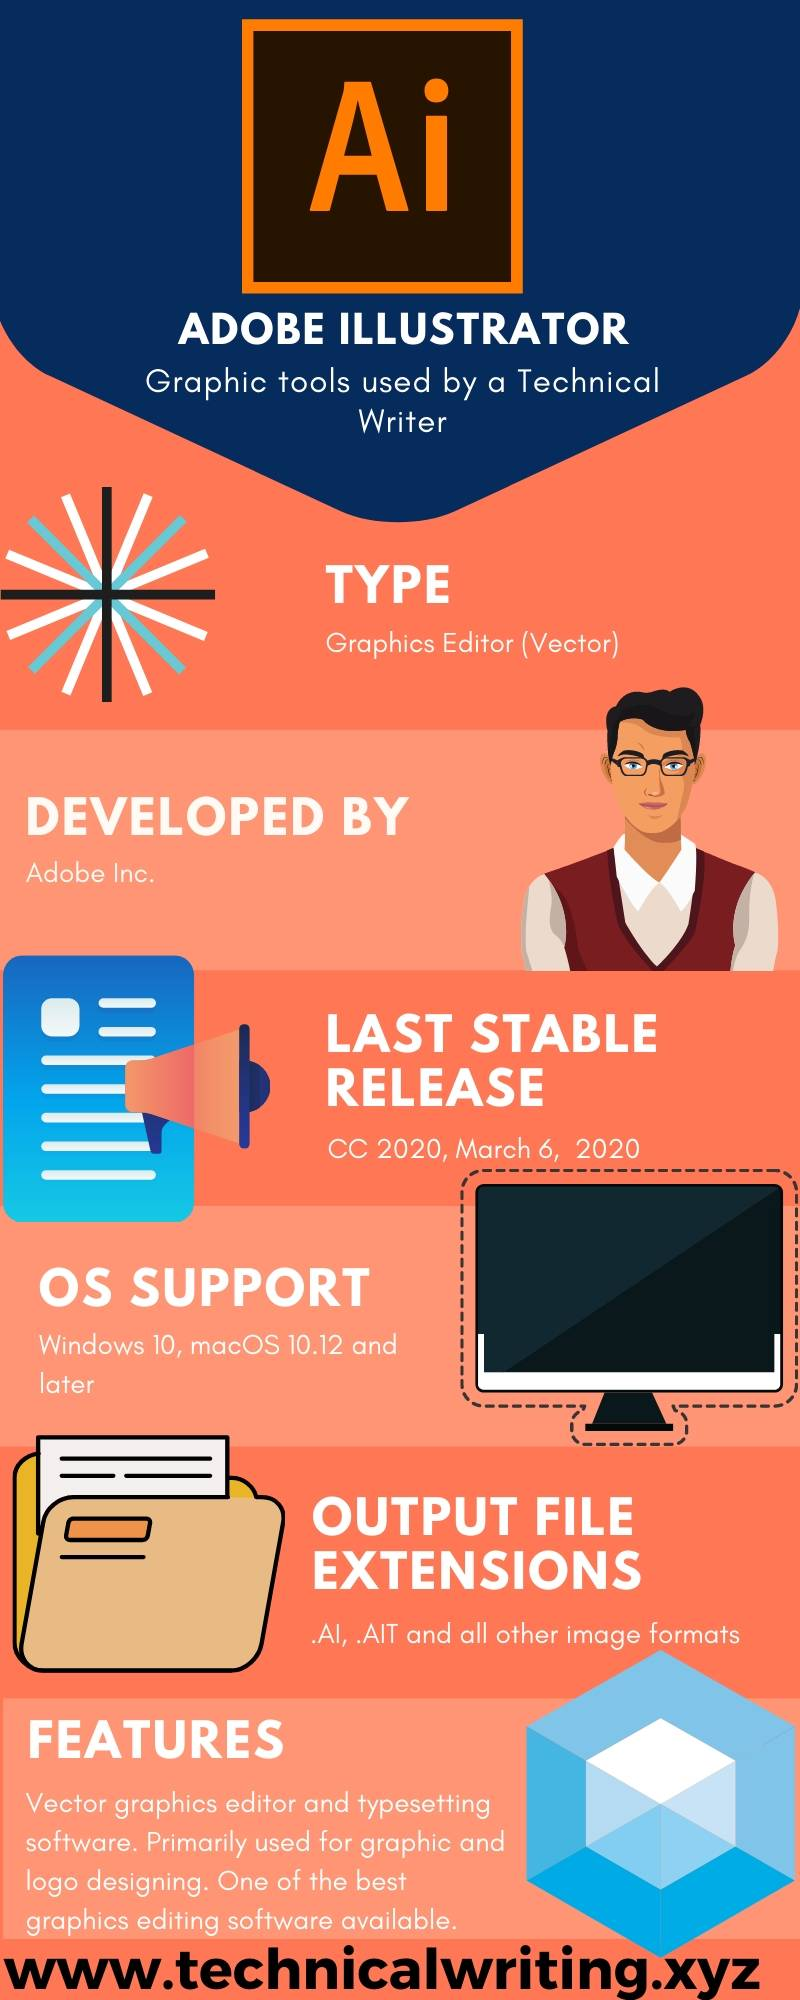 Adobe-illustrator-tool